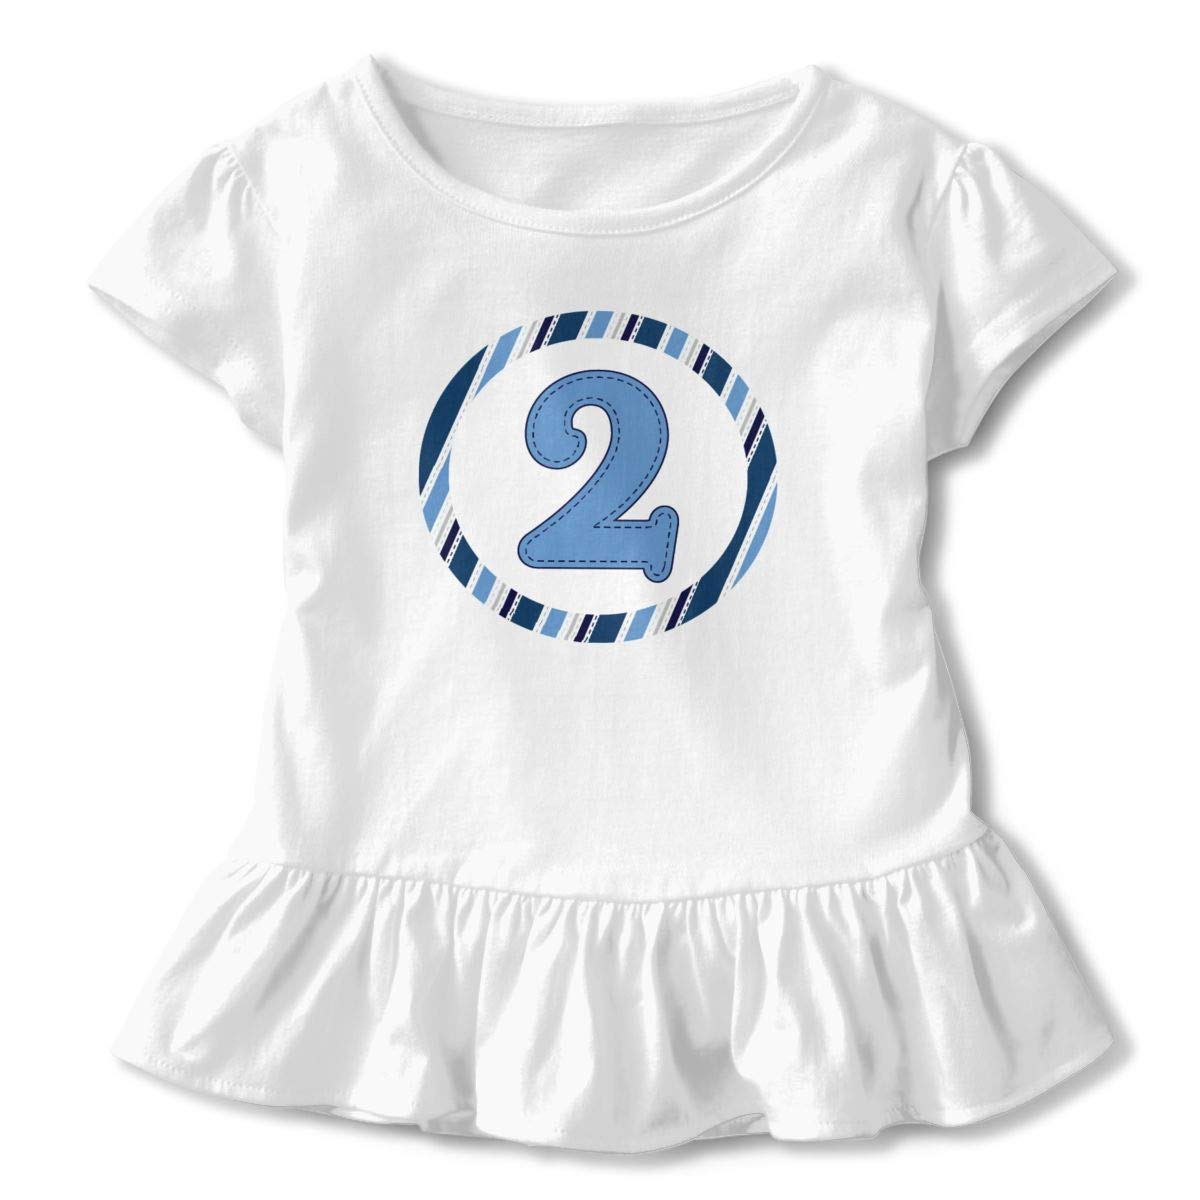 CZnuen 2nd Birthday Baby Girls Round Neck Short Sleeve Ruffle T-Shirt Top